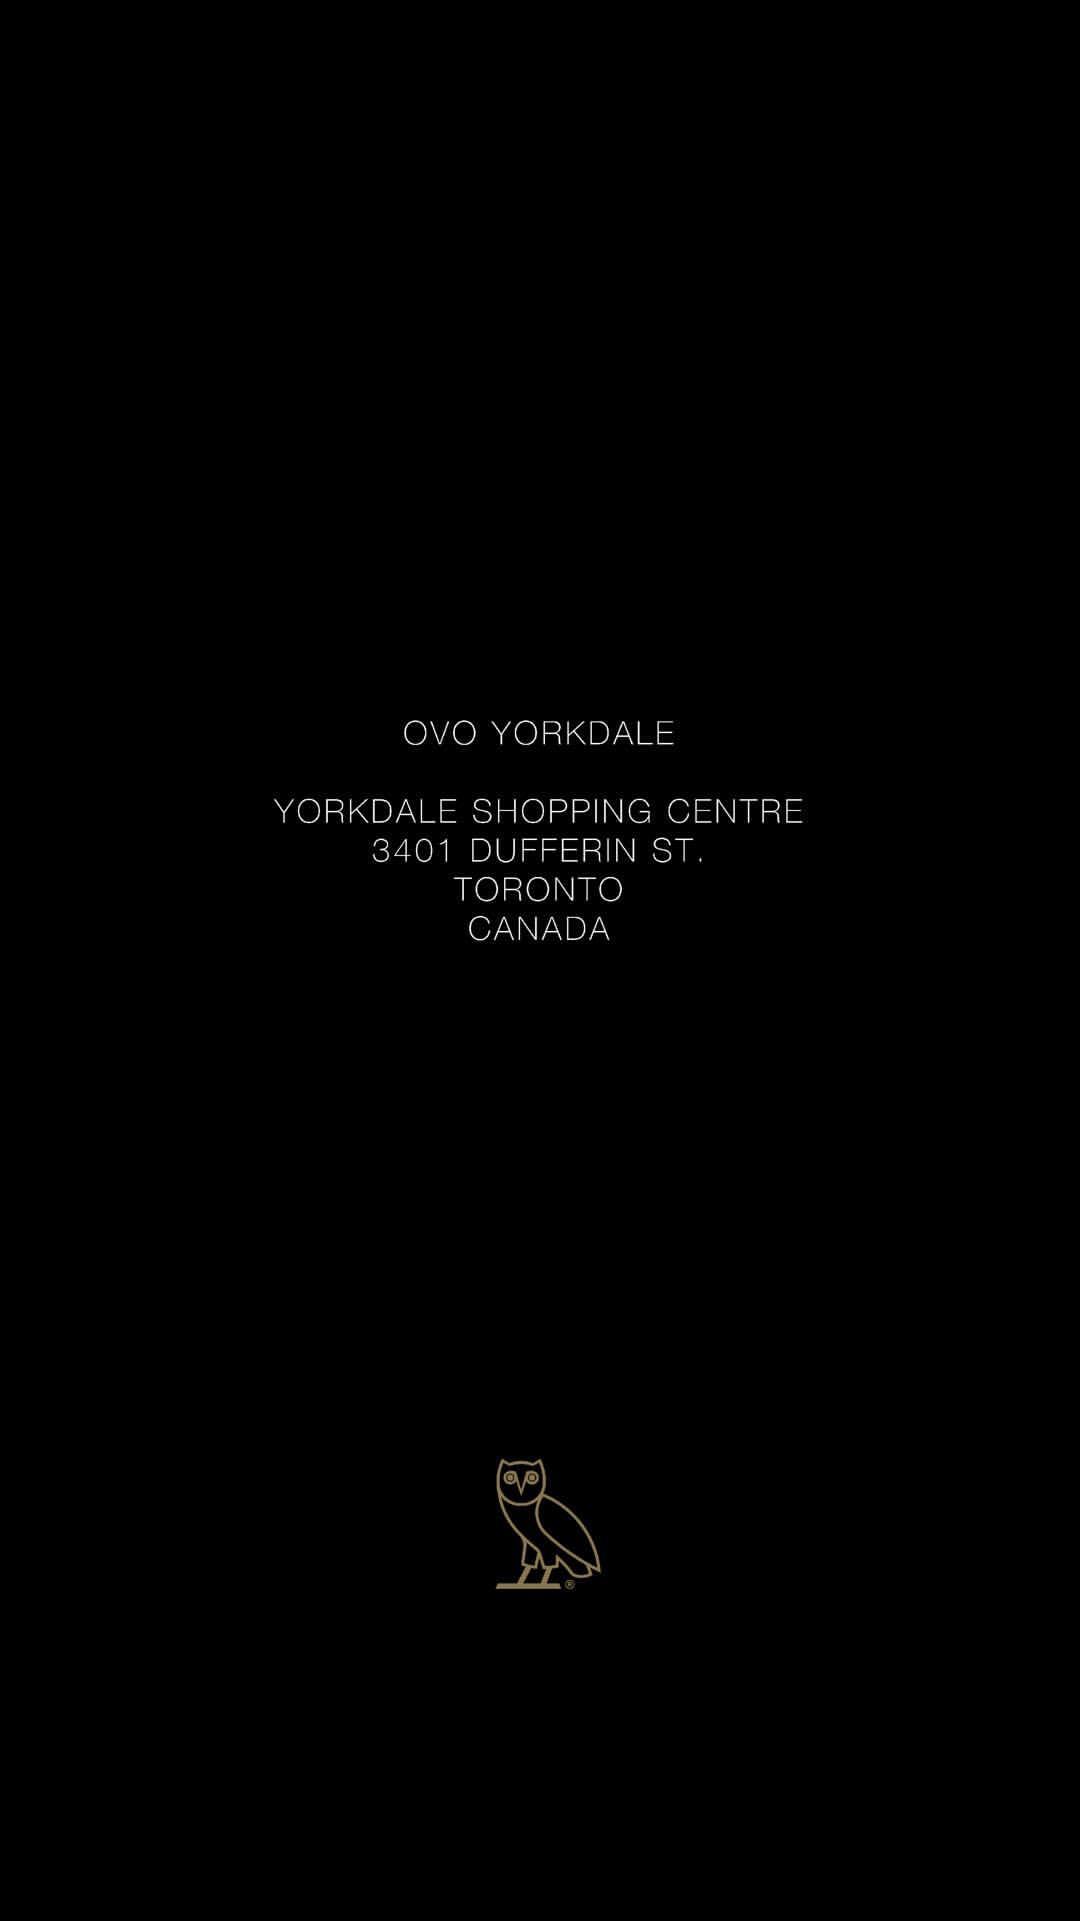 OVO Yorkdale